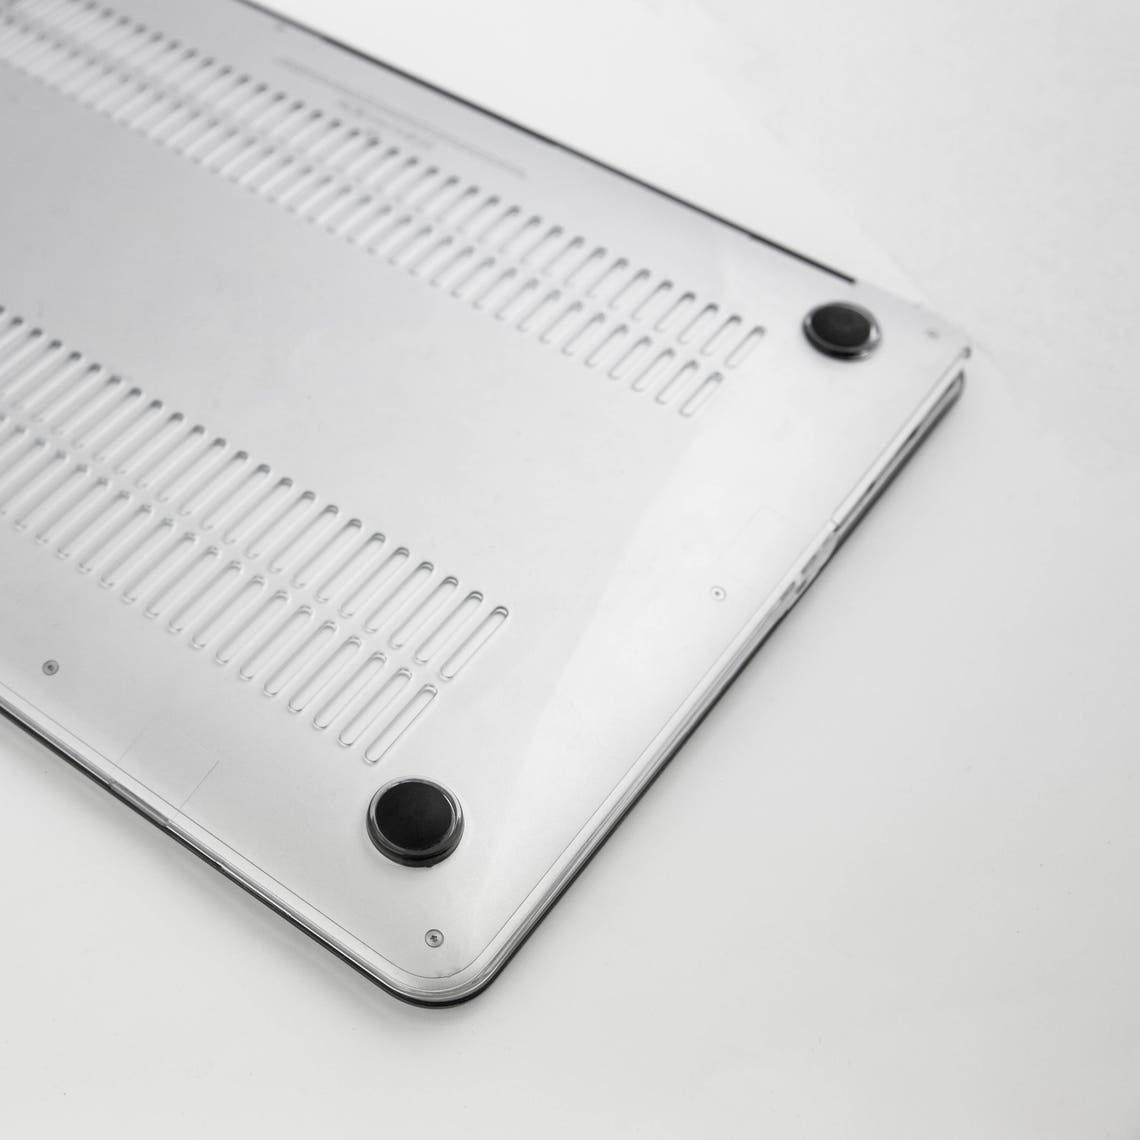 Gold Marble Macbook Air 13 Case Luxury Macook Pro 15 inch Case Wood Macbook 11 Case 2018 Macbook 12 inch Case New 2019 Macbook Case YZ2004